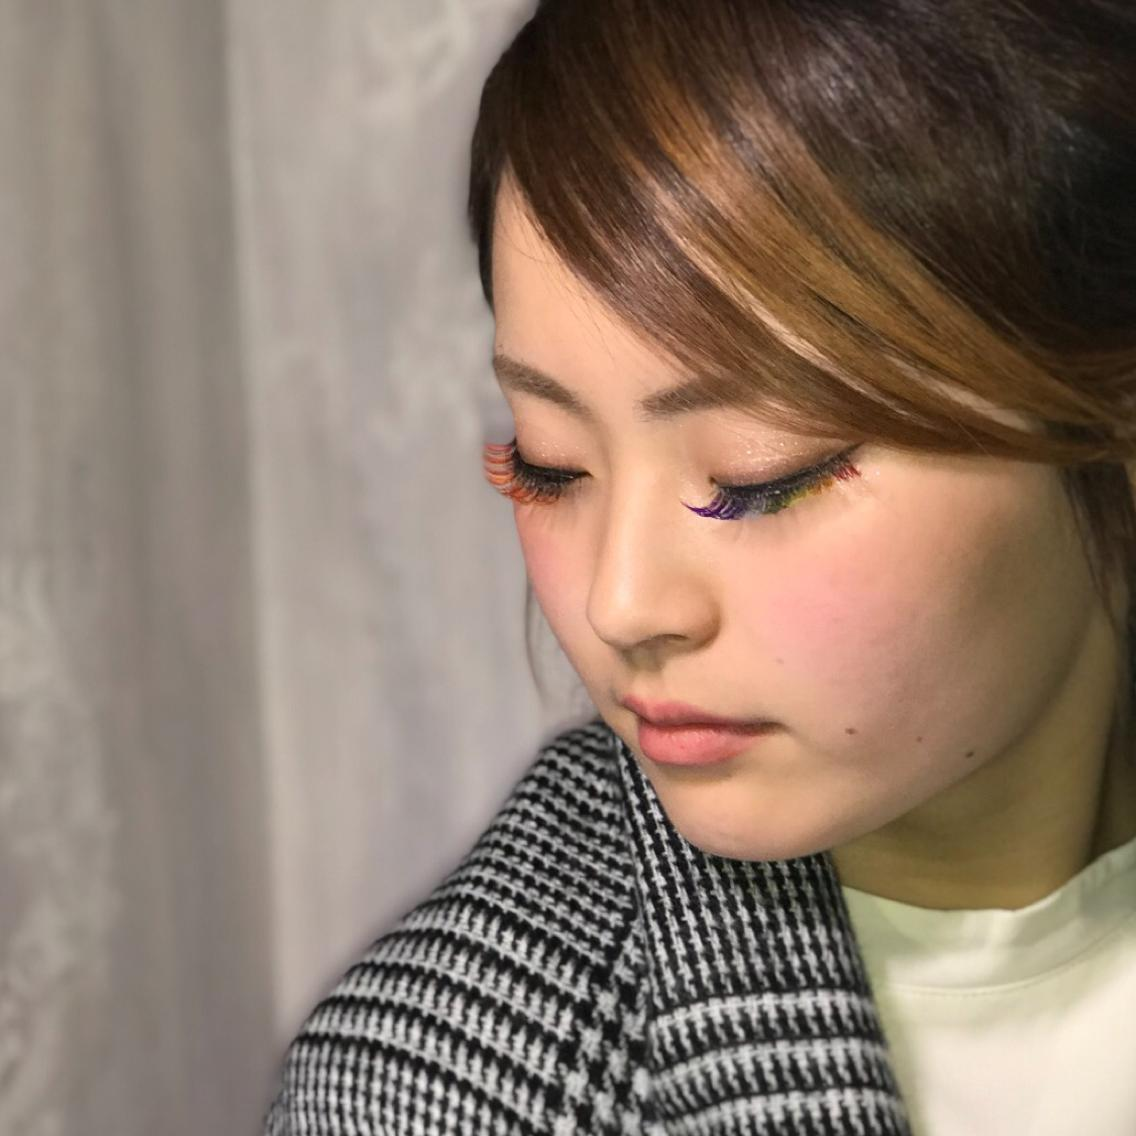 RIPPLEHAIR/PRIMEF.SALON所属・さとうゆうきの掲載